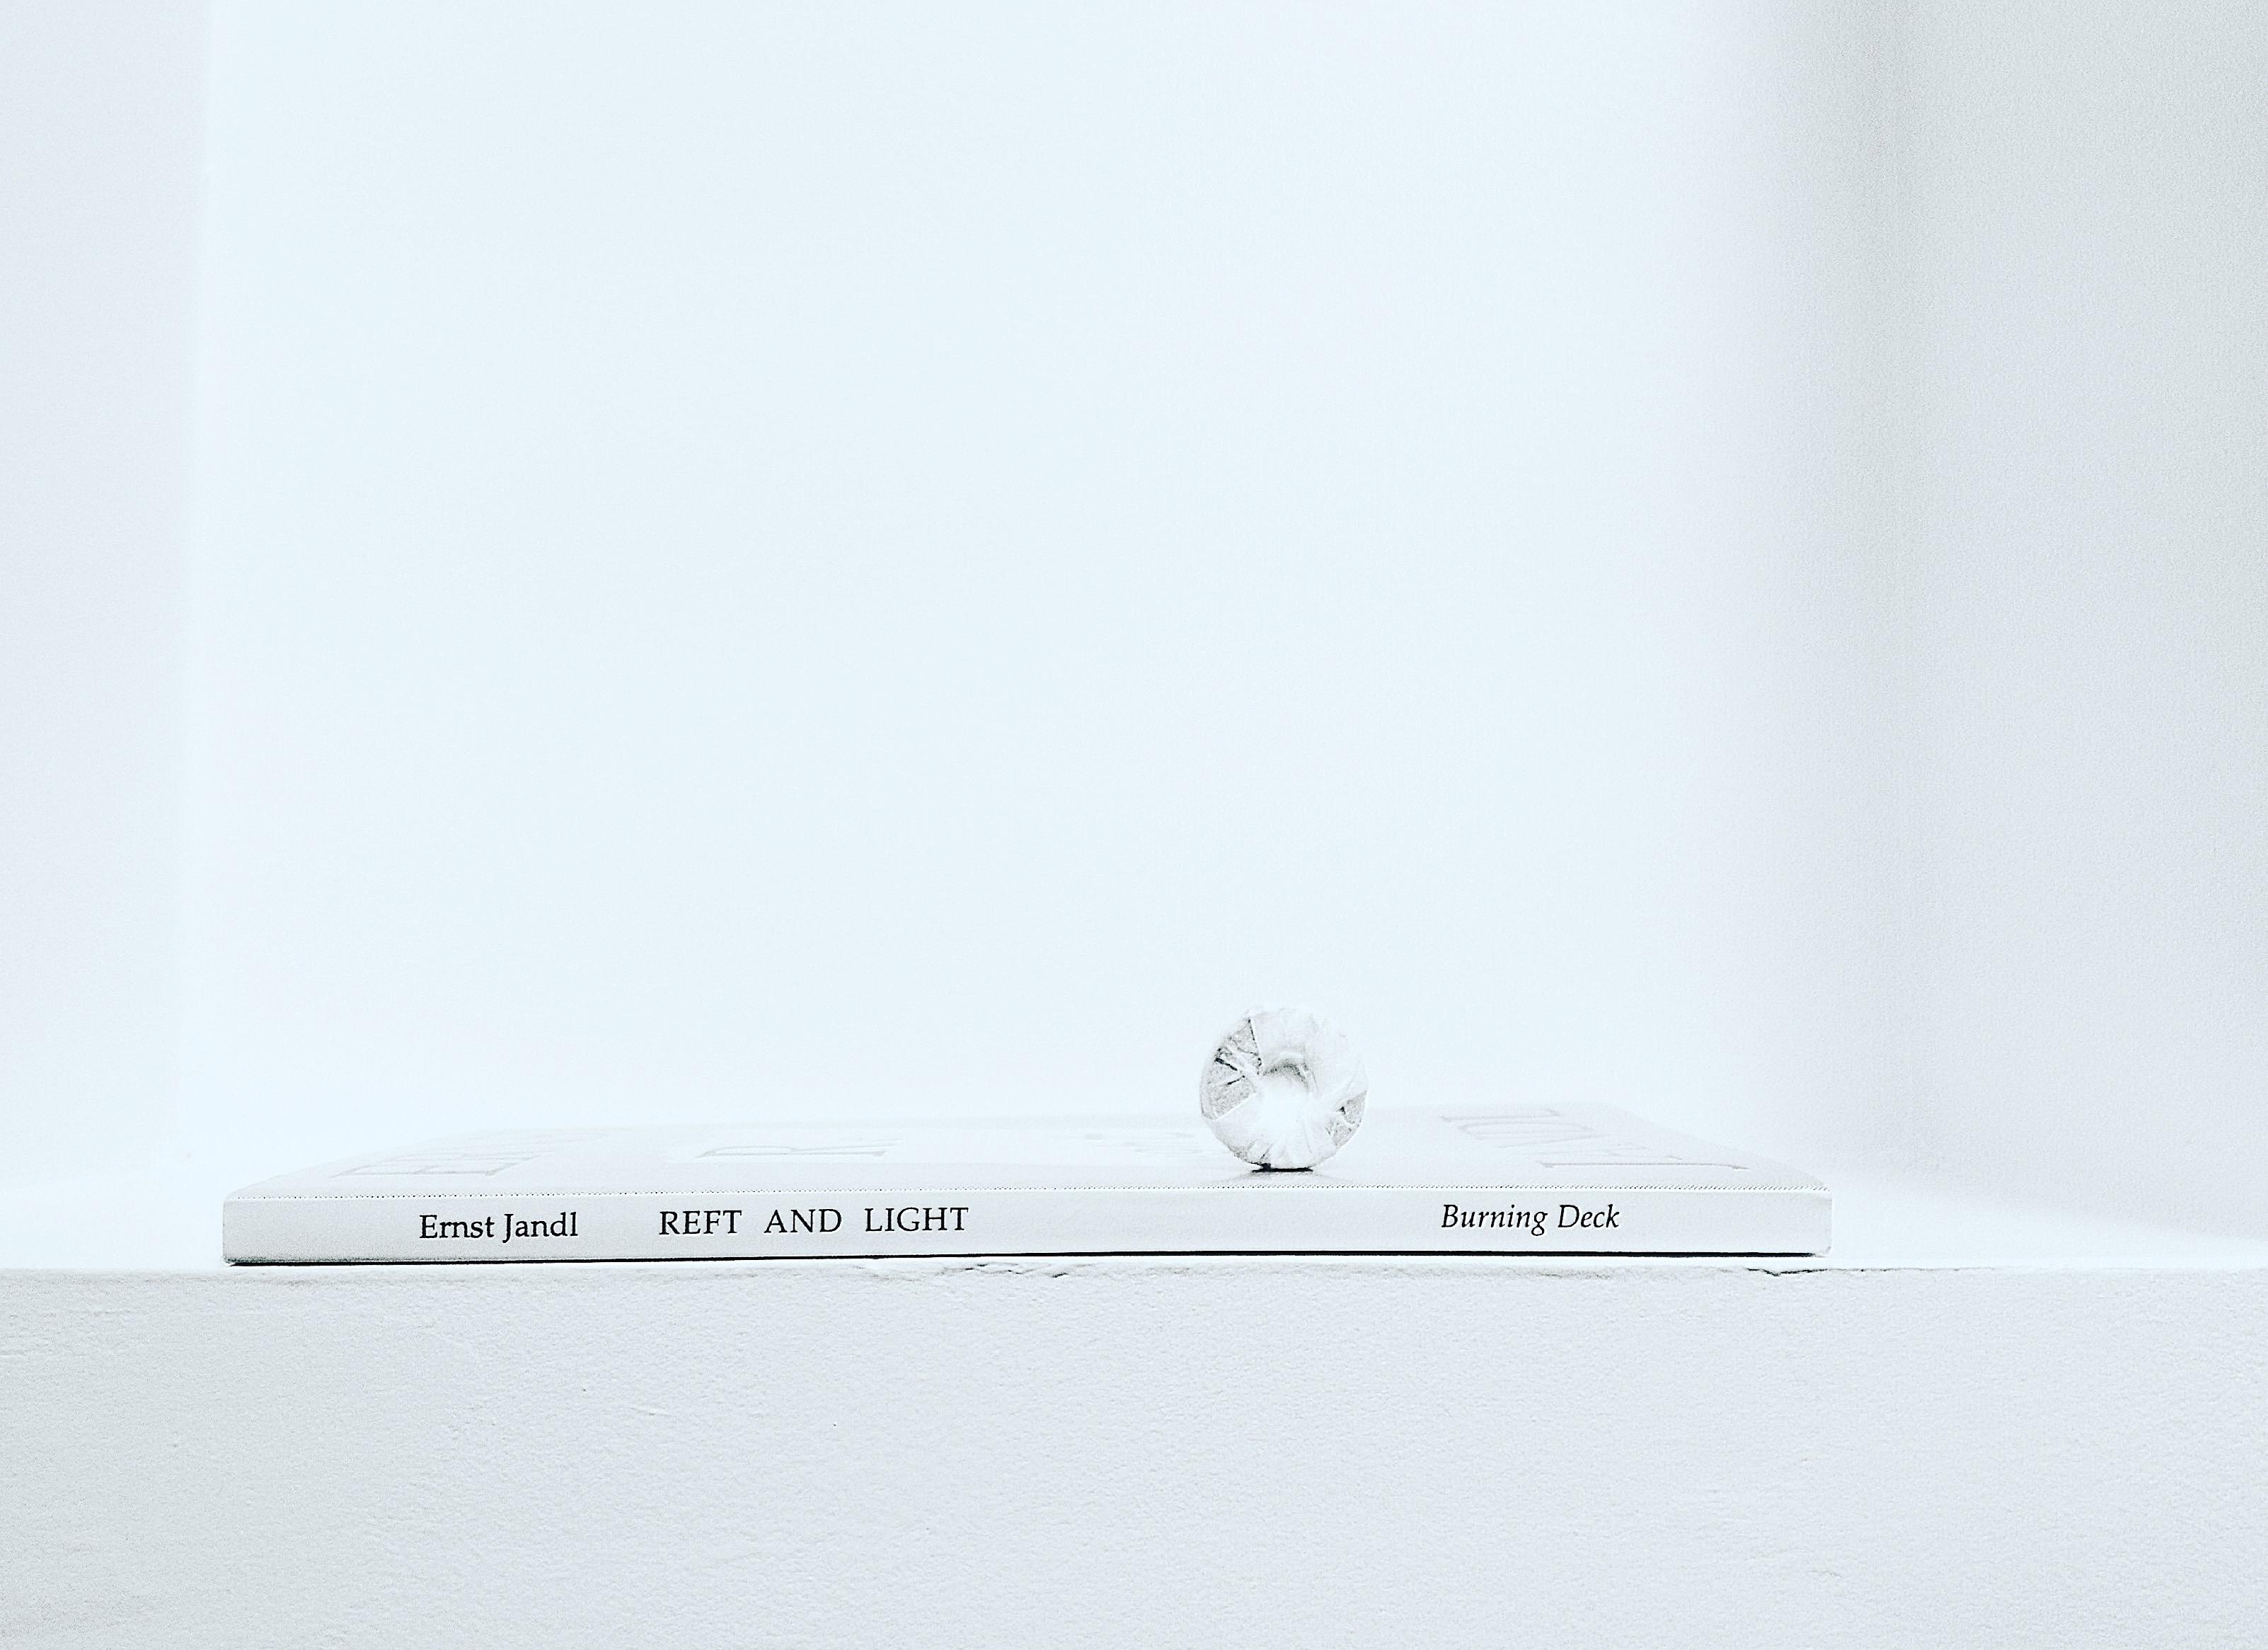 Reft and Light by Ernst Jandl. Foto Jurga Po Alessi